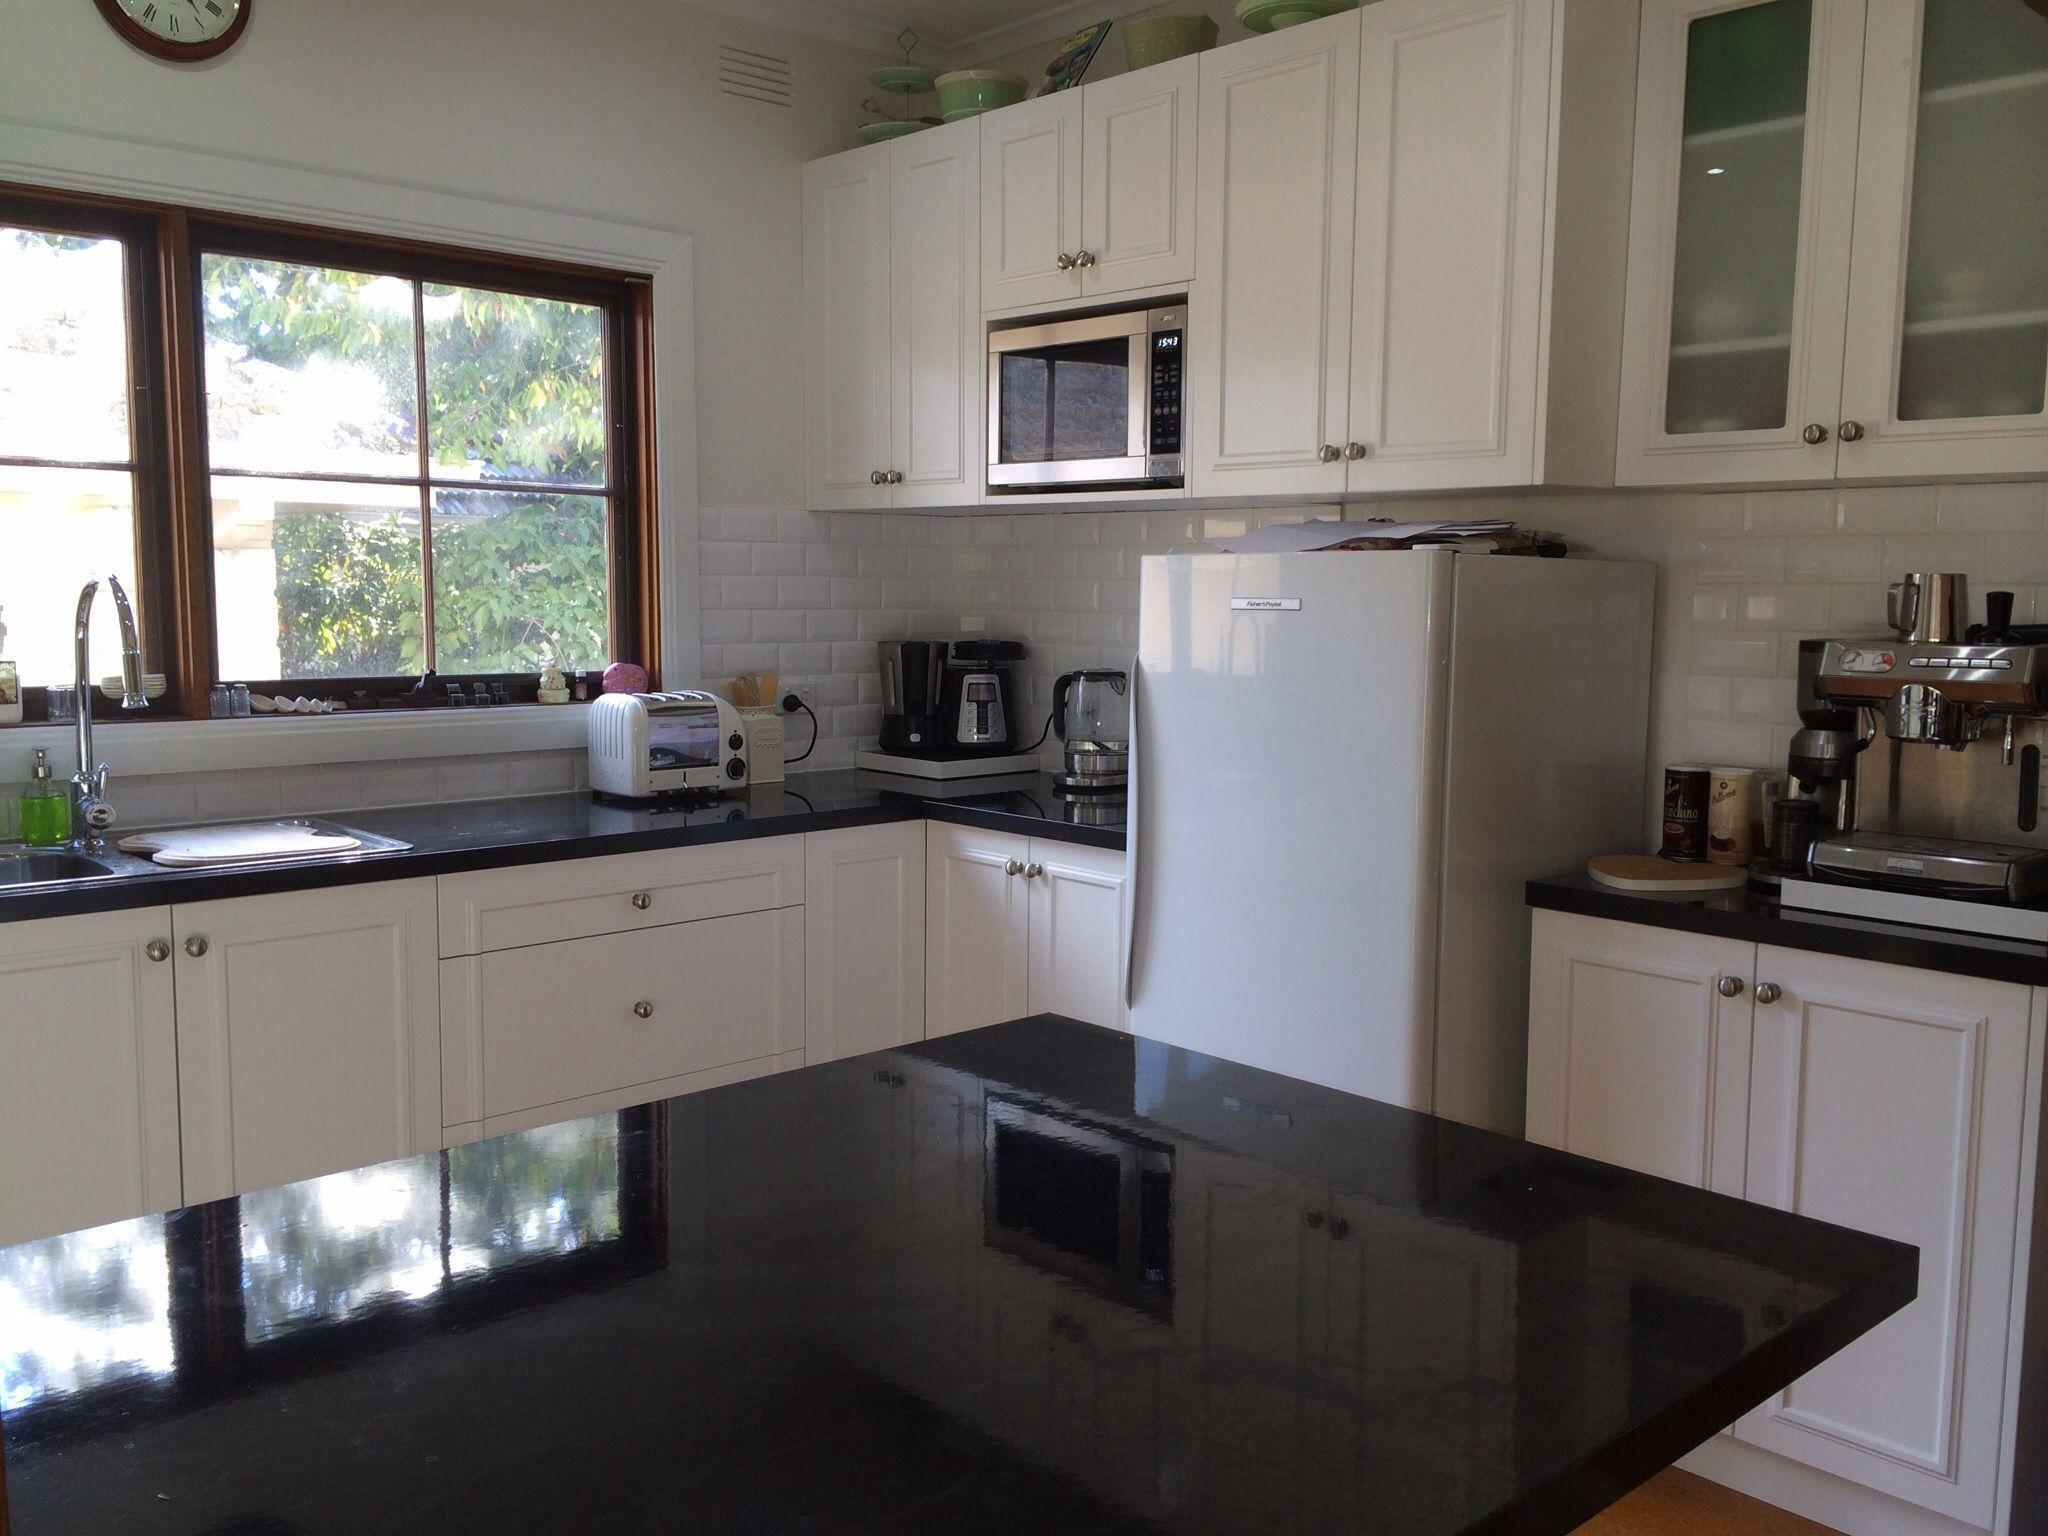 White Kitchen Black Benchtop finished result with white subway tile splash back, black benchtop